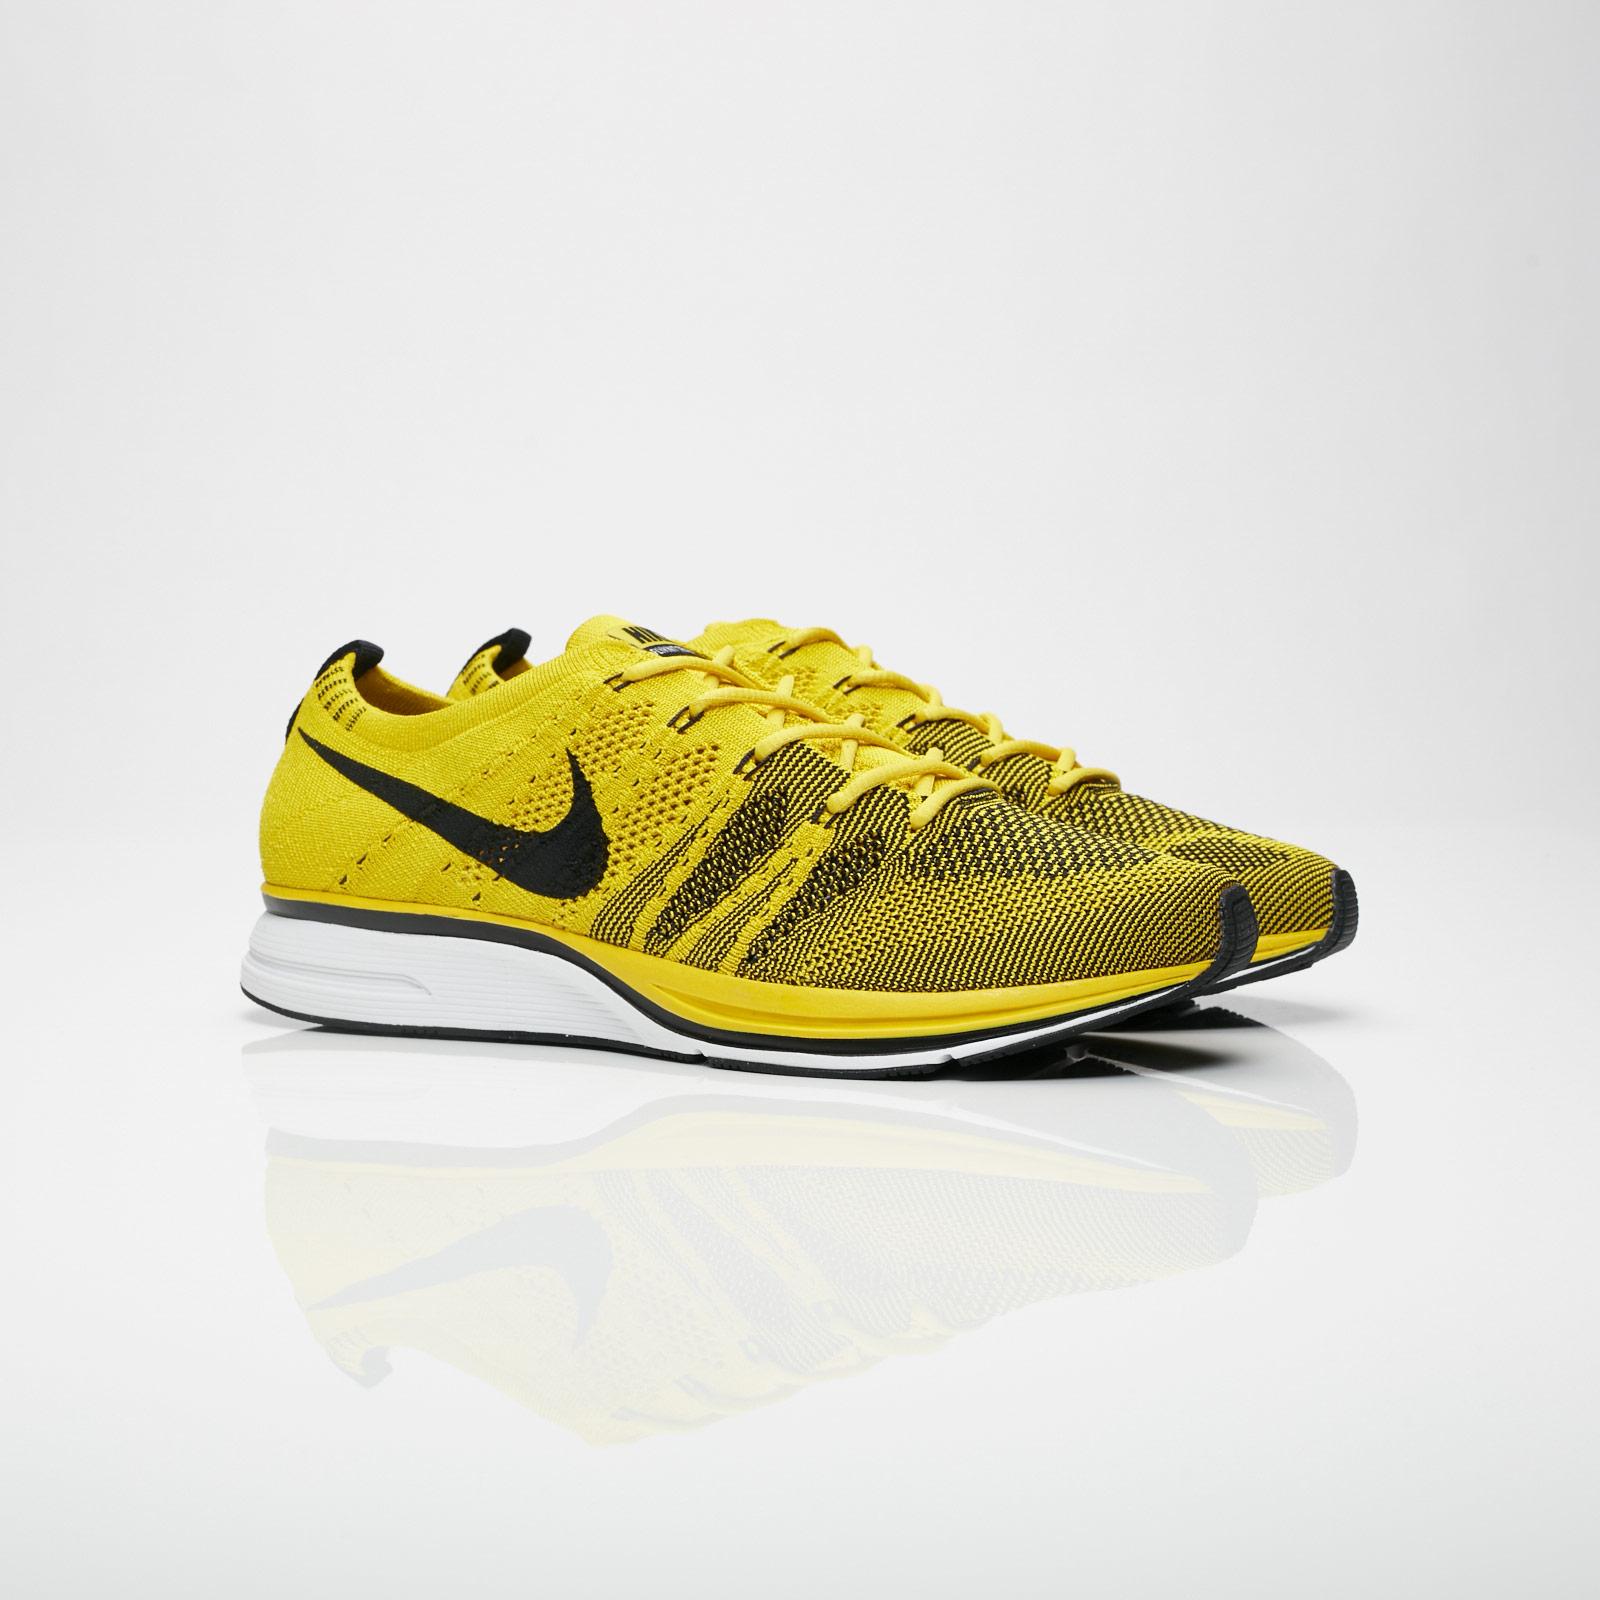 designer fashion f2535 fded1 Nike Sportswear Flyknit Trainer